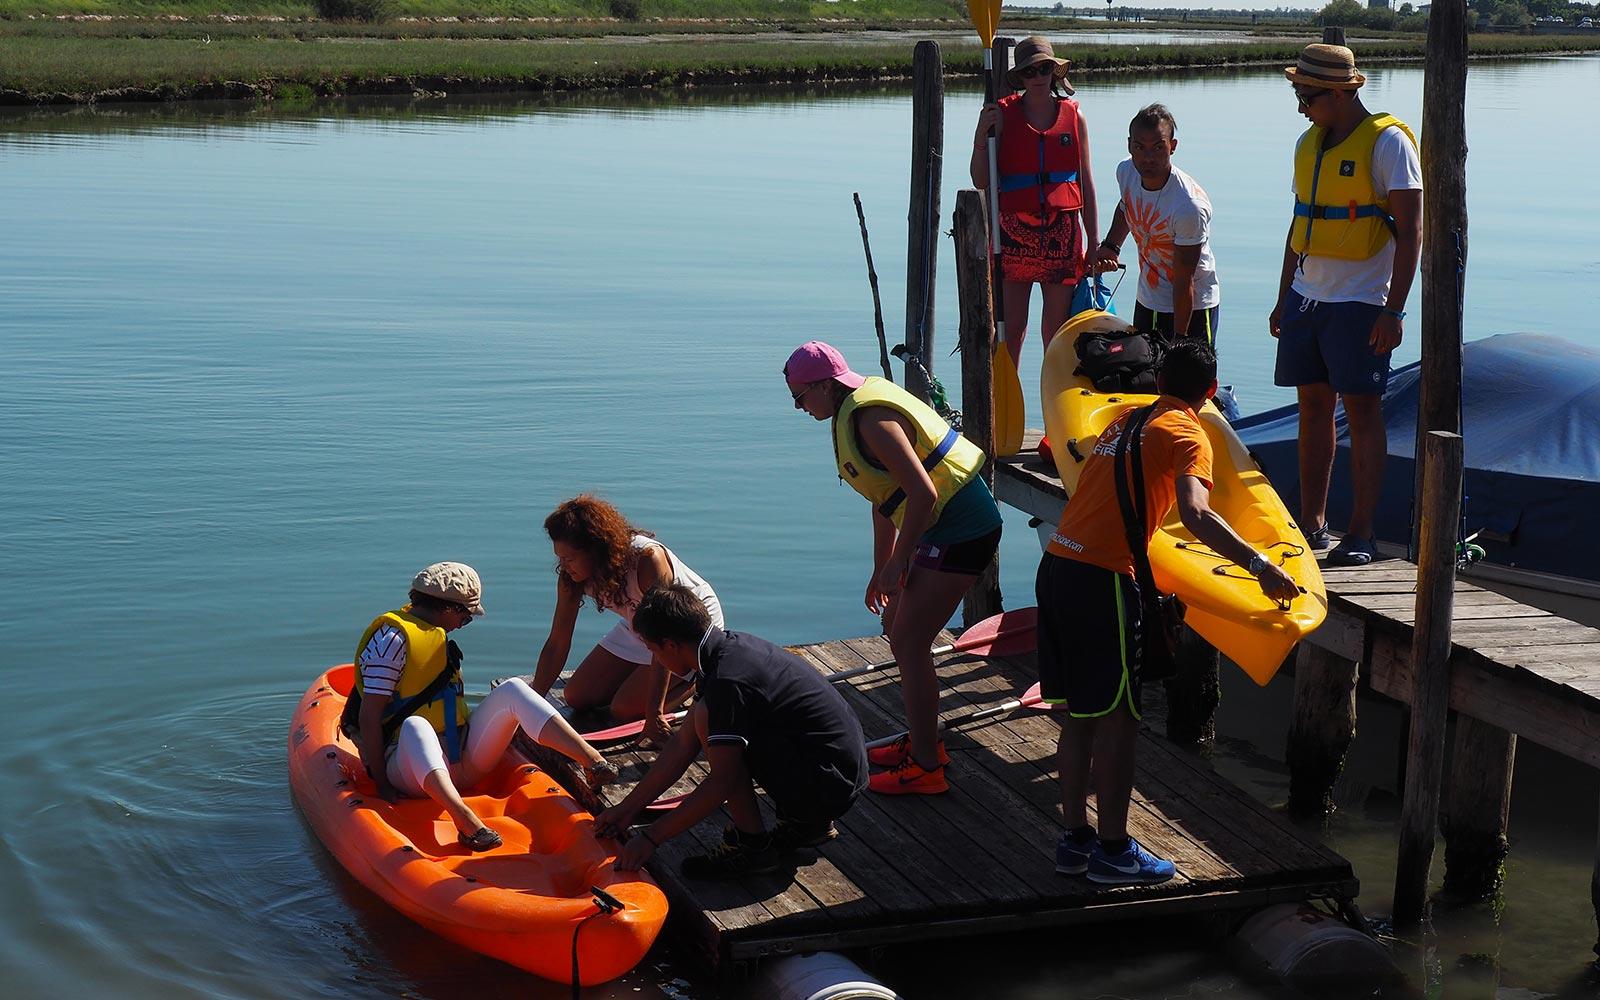 7 Canoe trip in Venice Lagoon from Cavallino - Jesolo